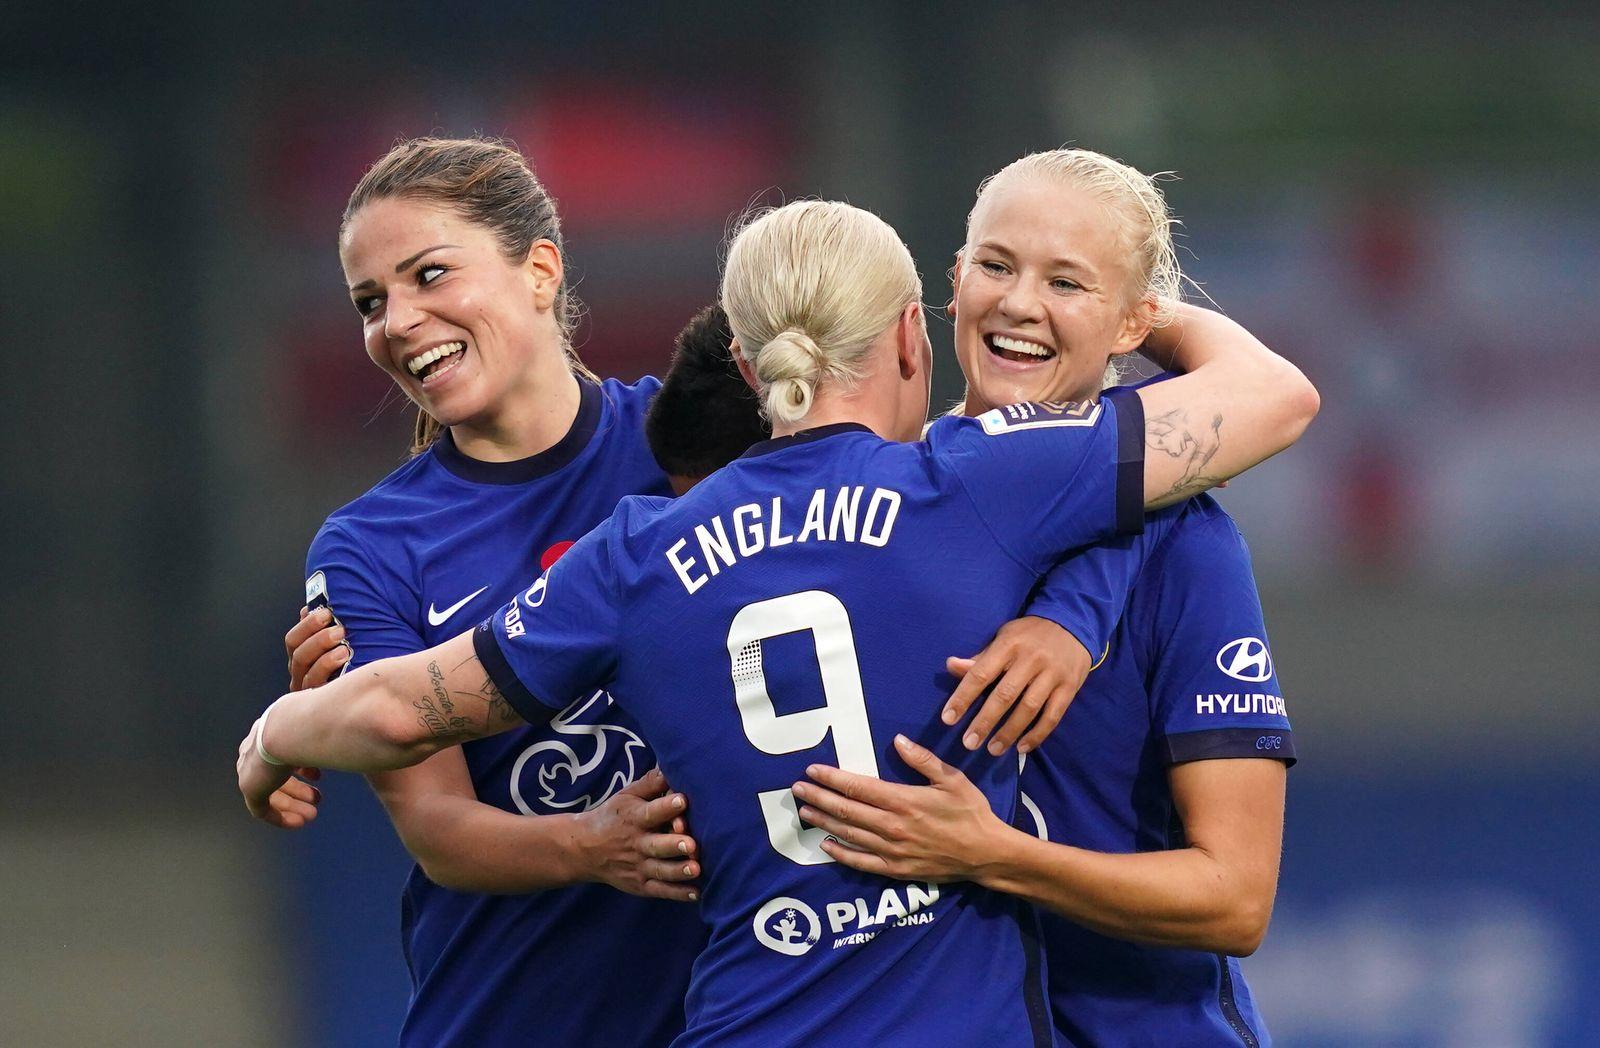 Chelsea v Everton - FA Women s Super League - Kingsmeadow Cheslea s Pernille Harder (right) celebrates scoring her side